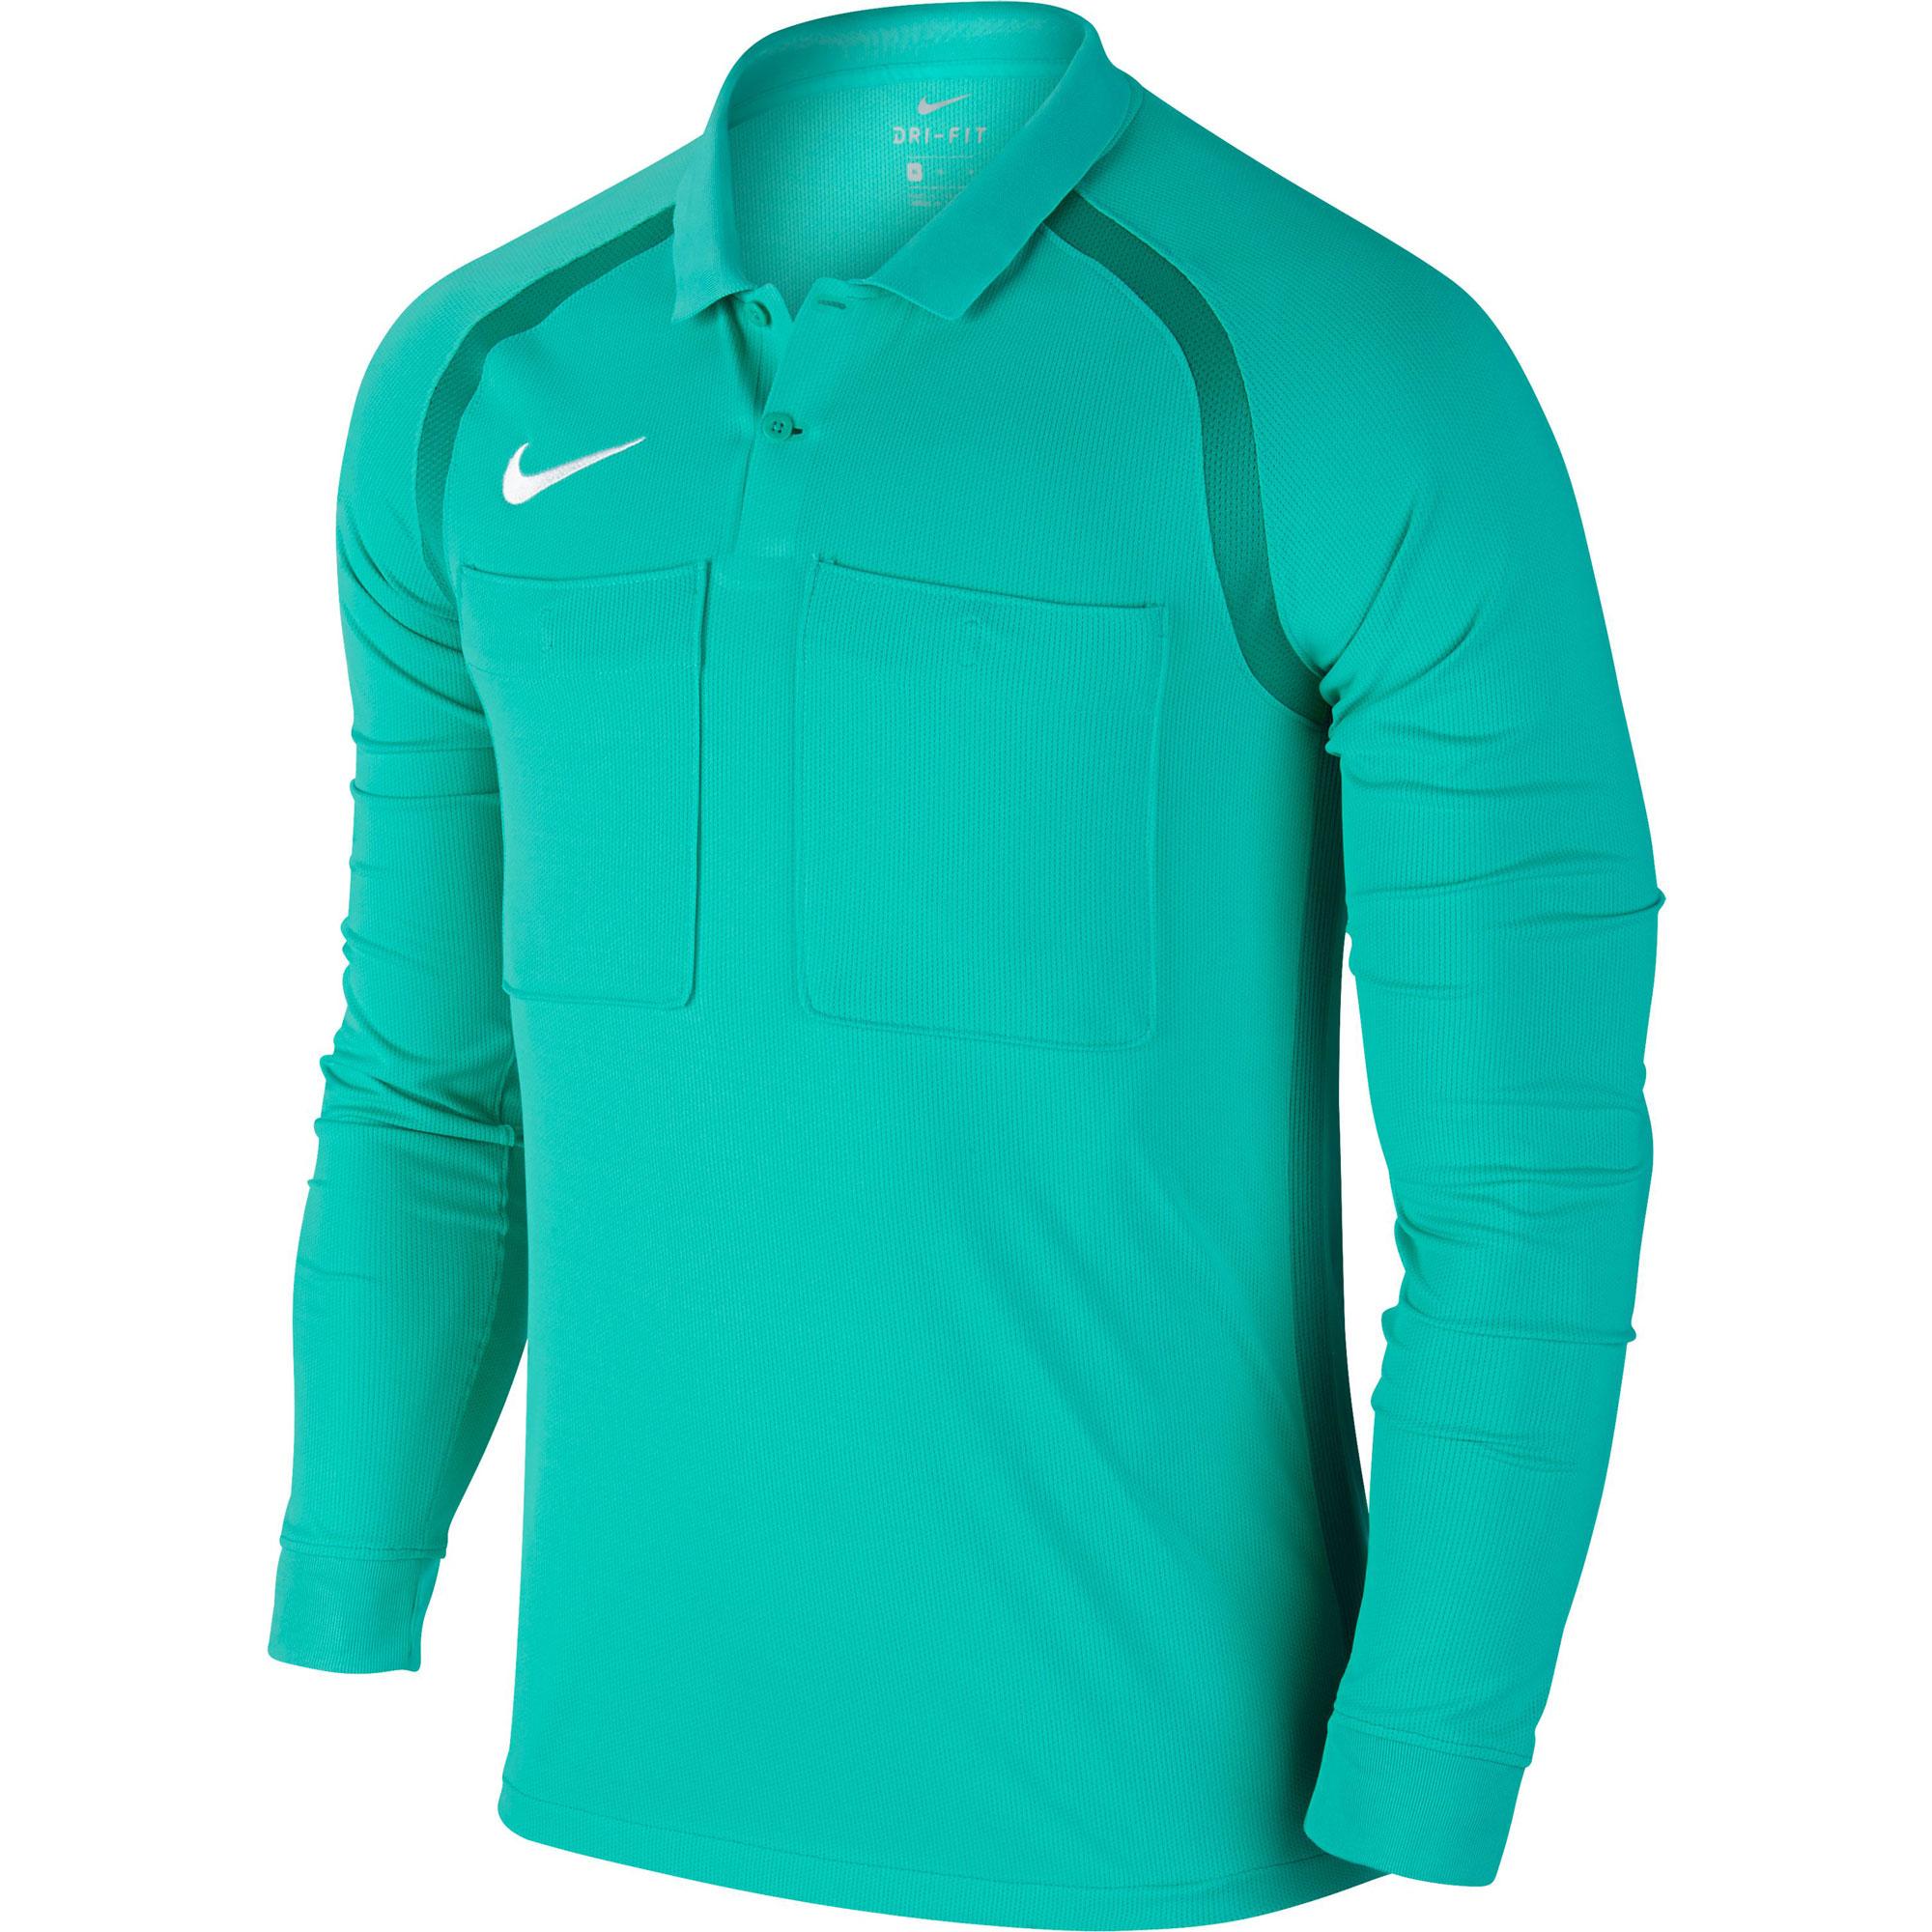 Nike Herren Schiedsrichter Langarm Trikot Team Referee Jersey 807704-317 XL